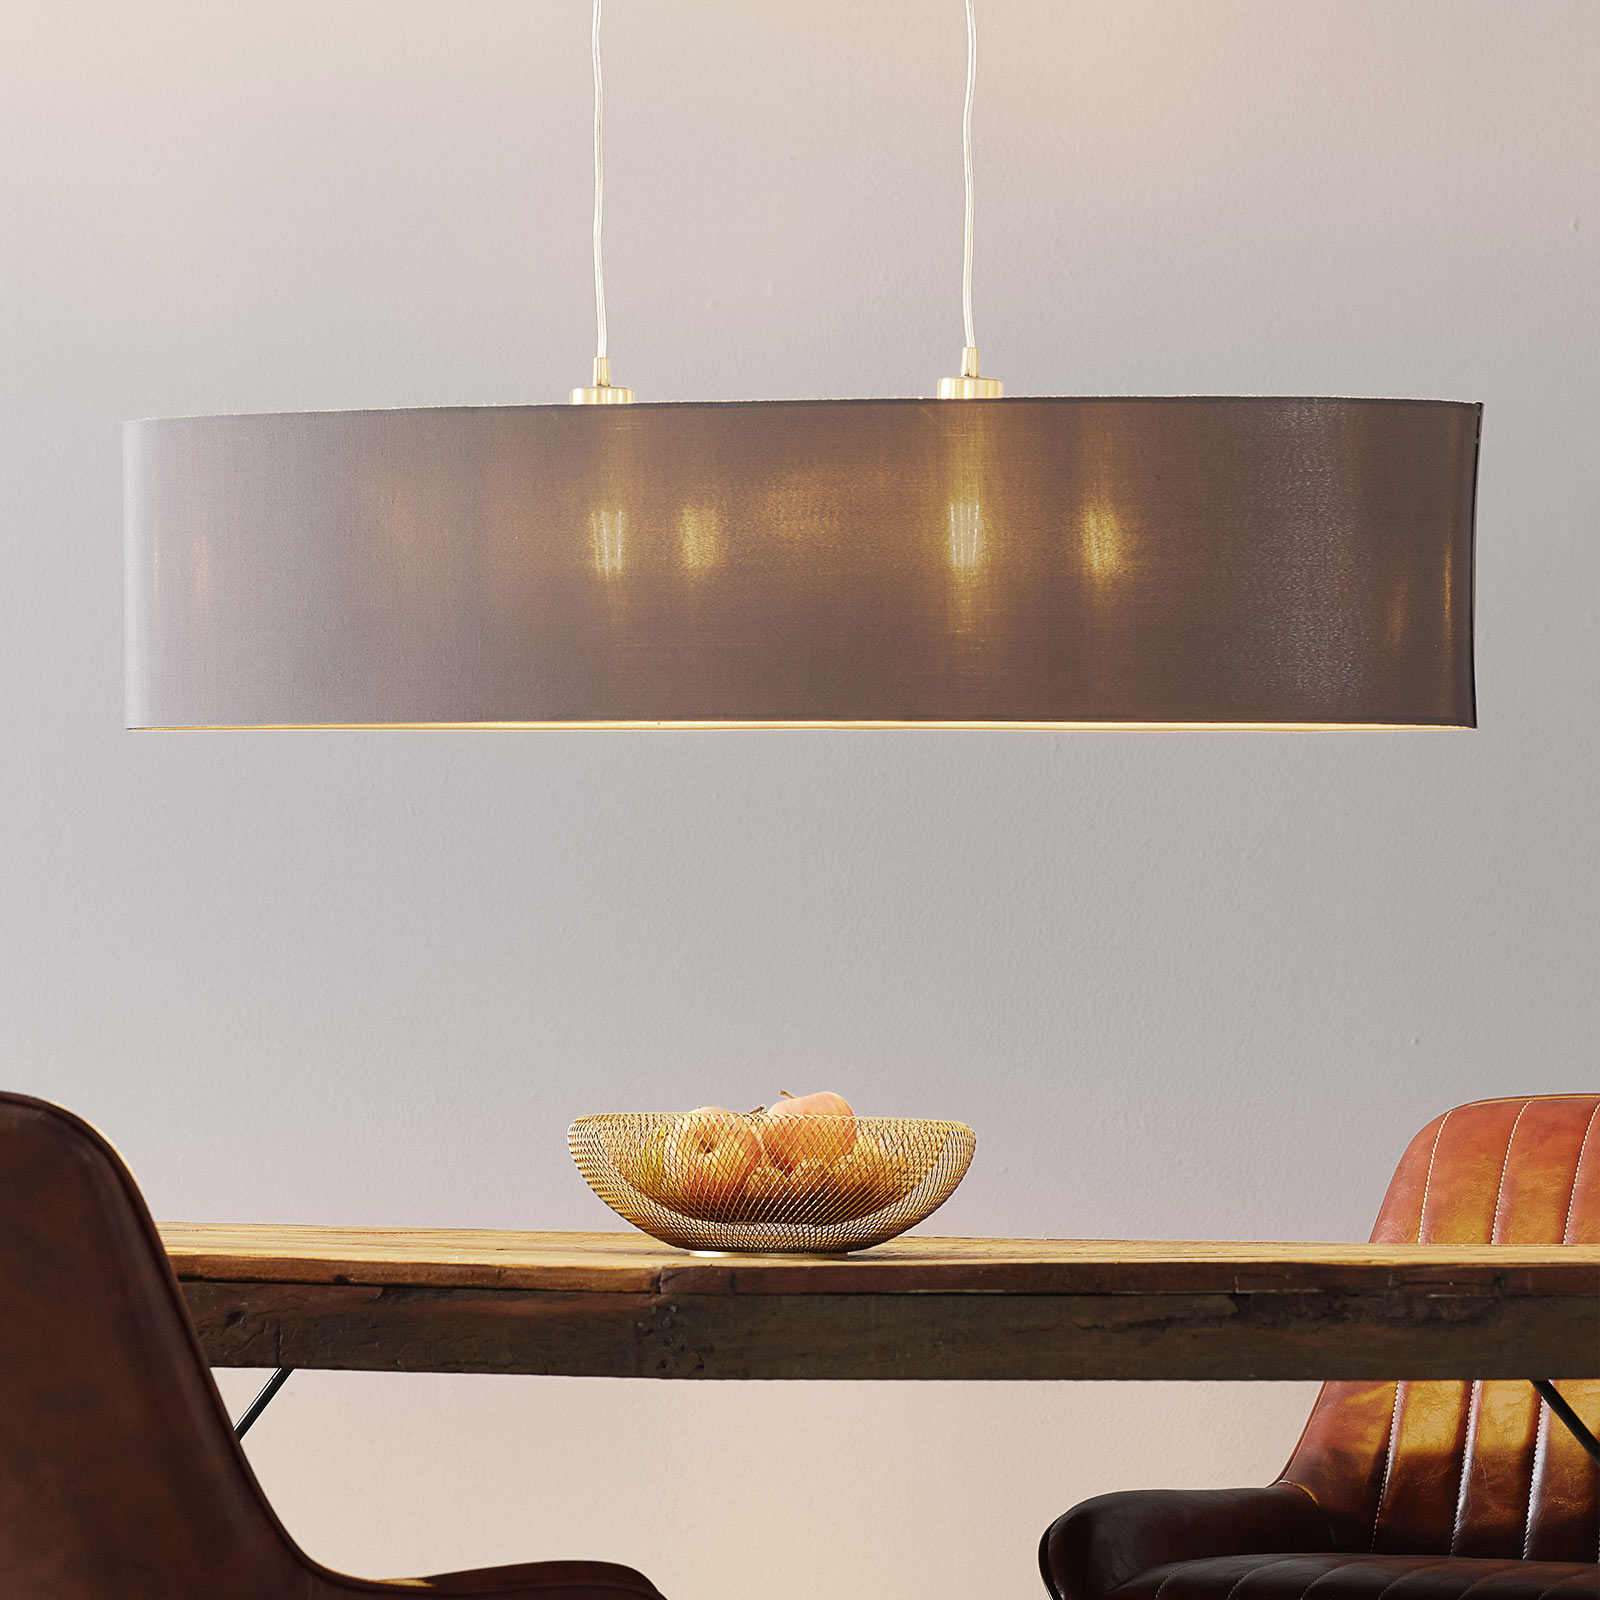 Lampa wisząca z tkaniny Maserlo, cappuccino 100 cm